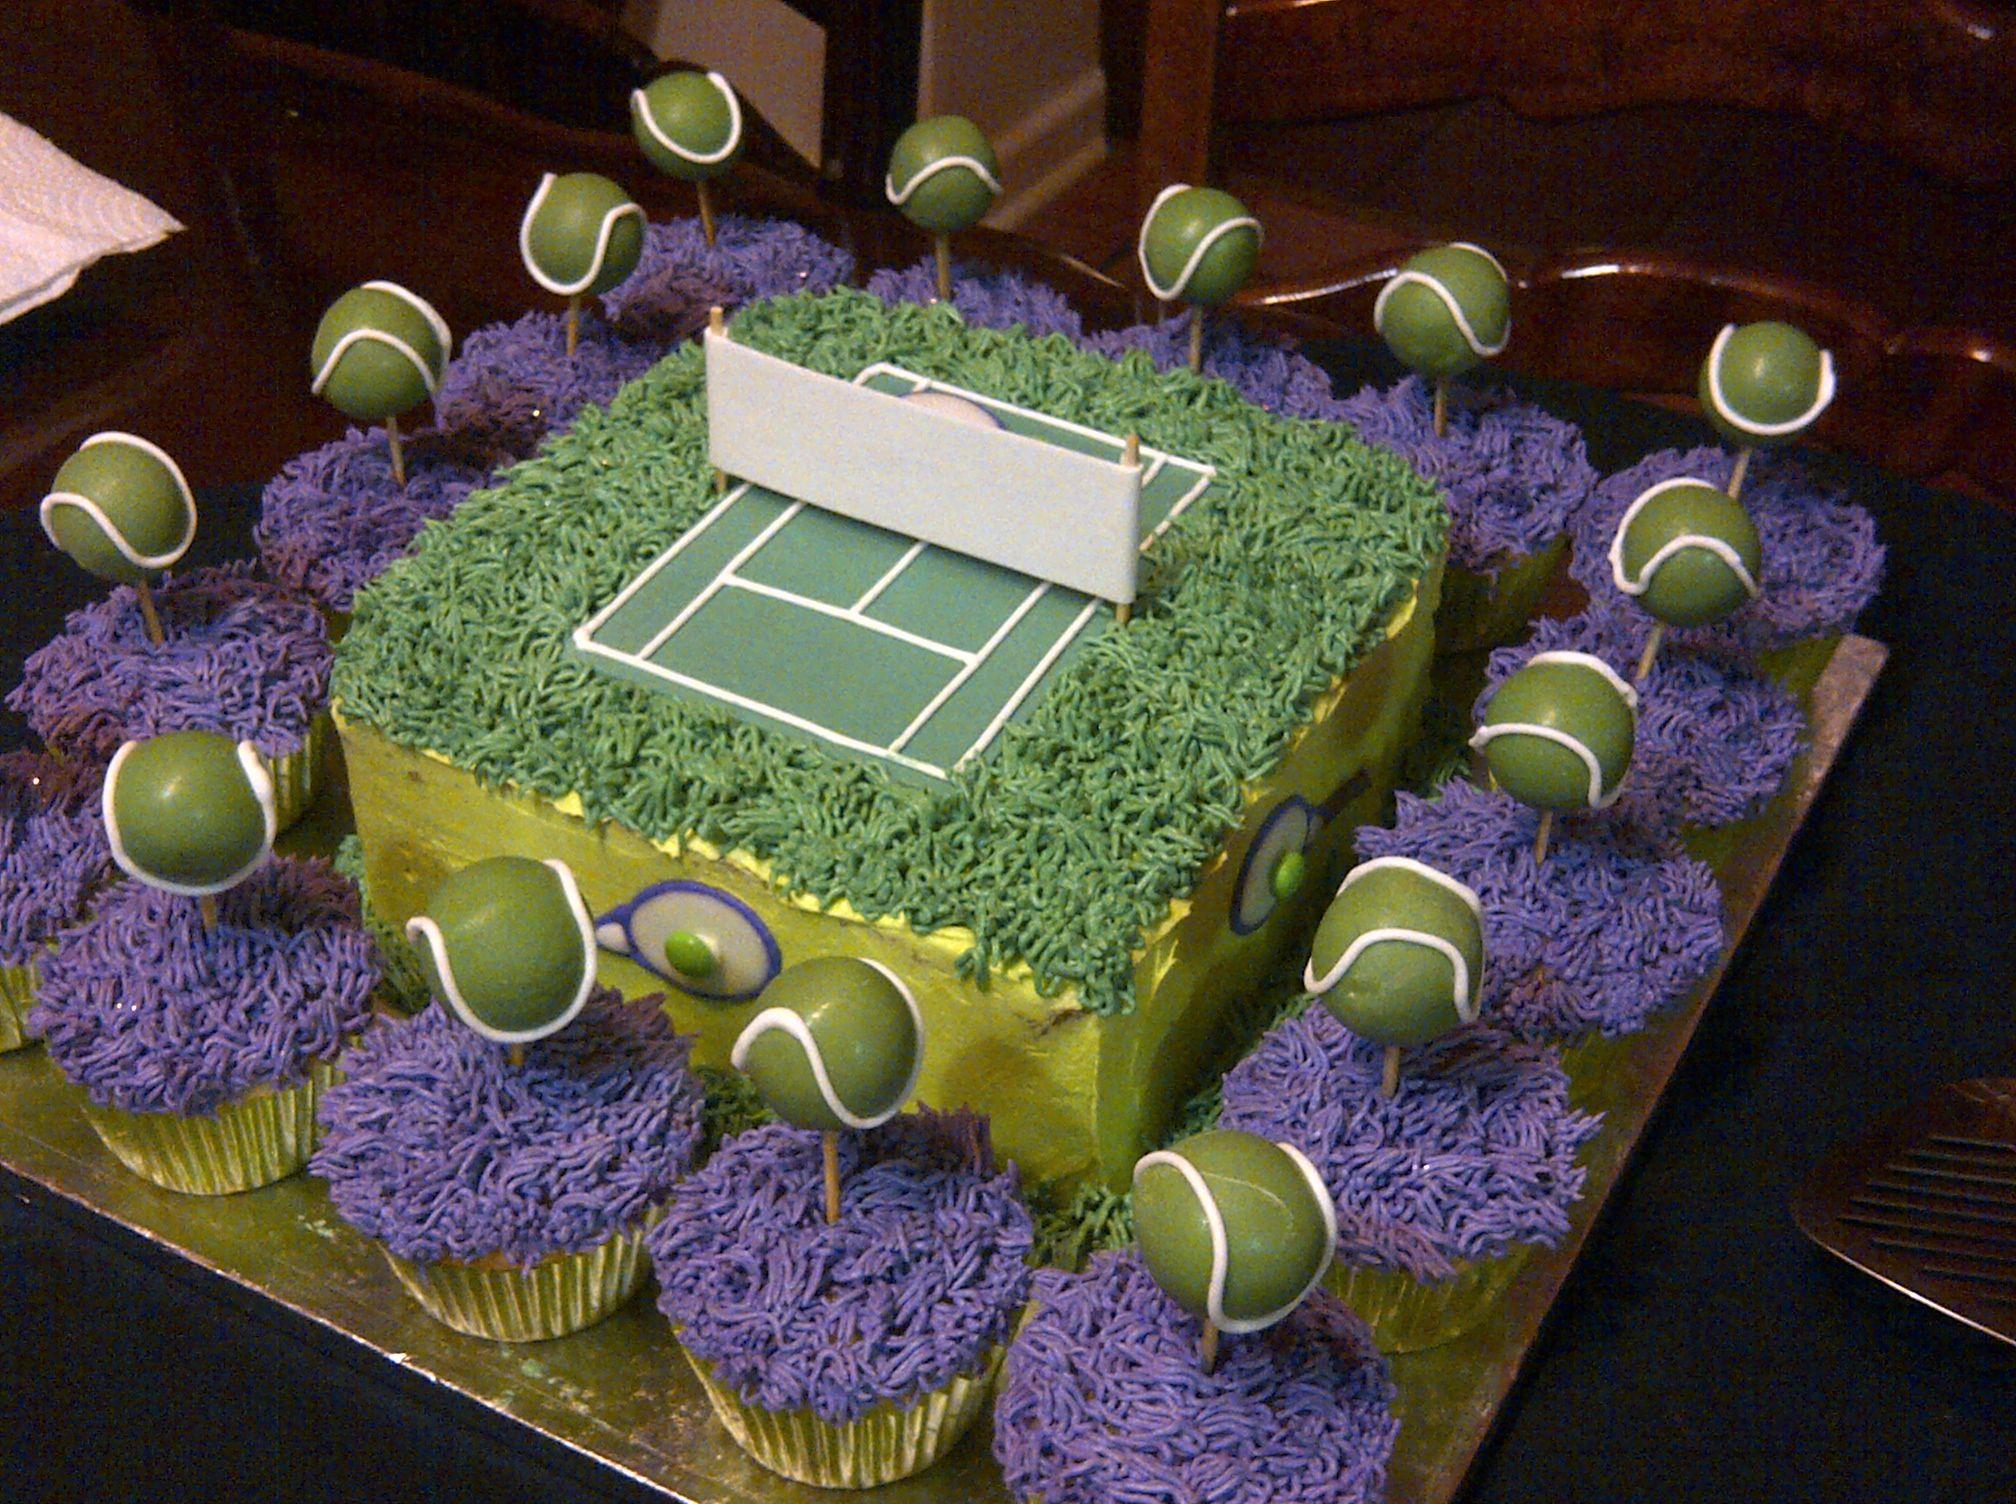 Tennis Court Cake With Cupcakes And Cakepop Tennis Balls Cake